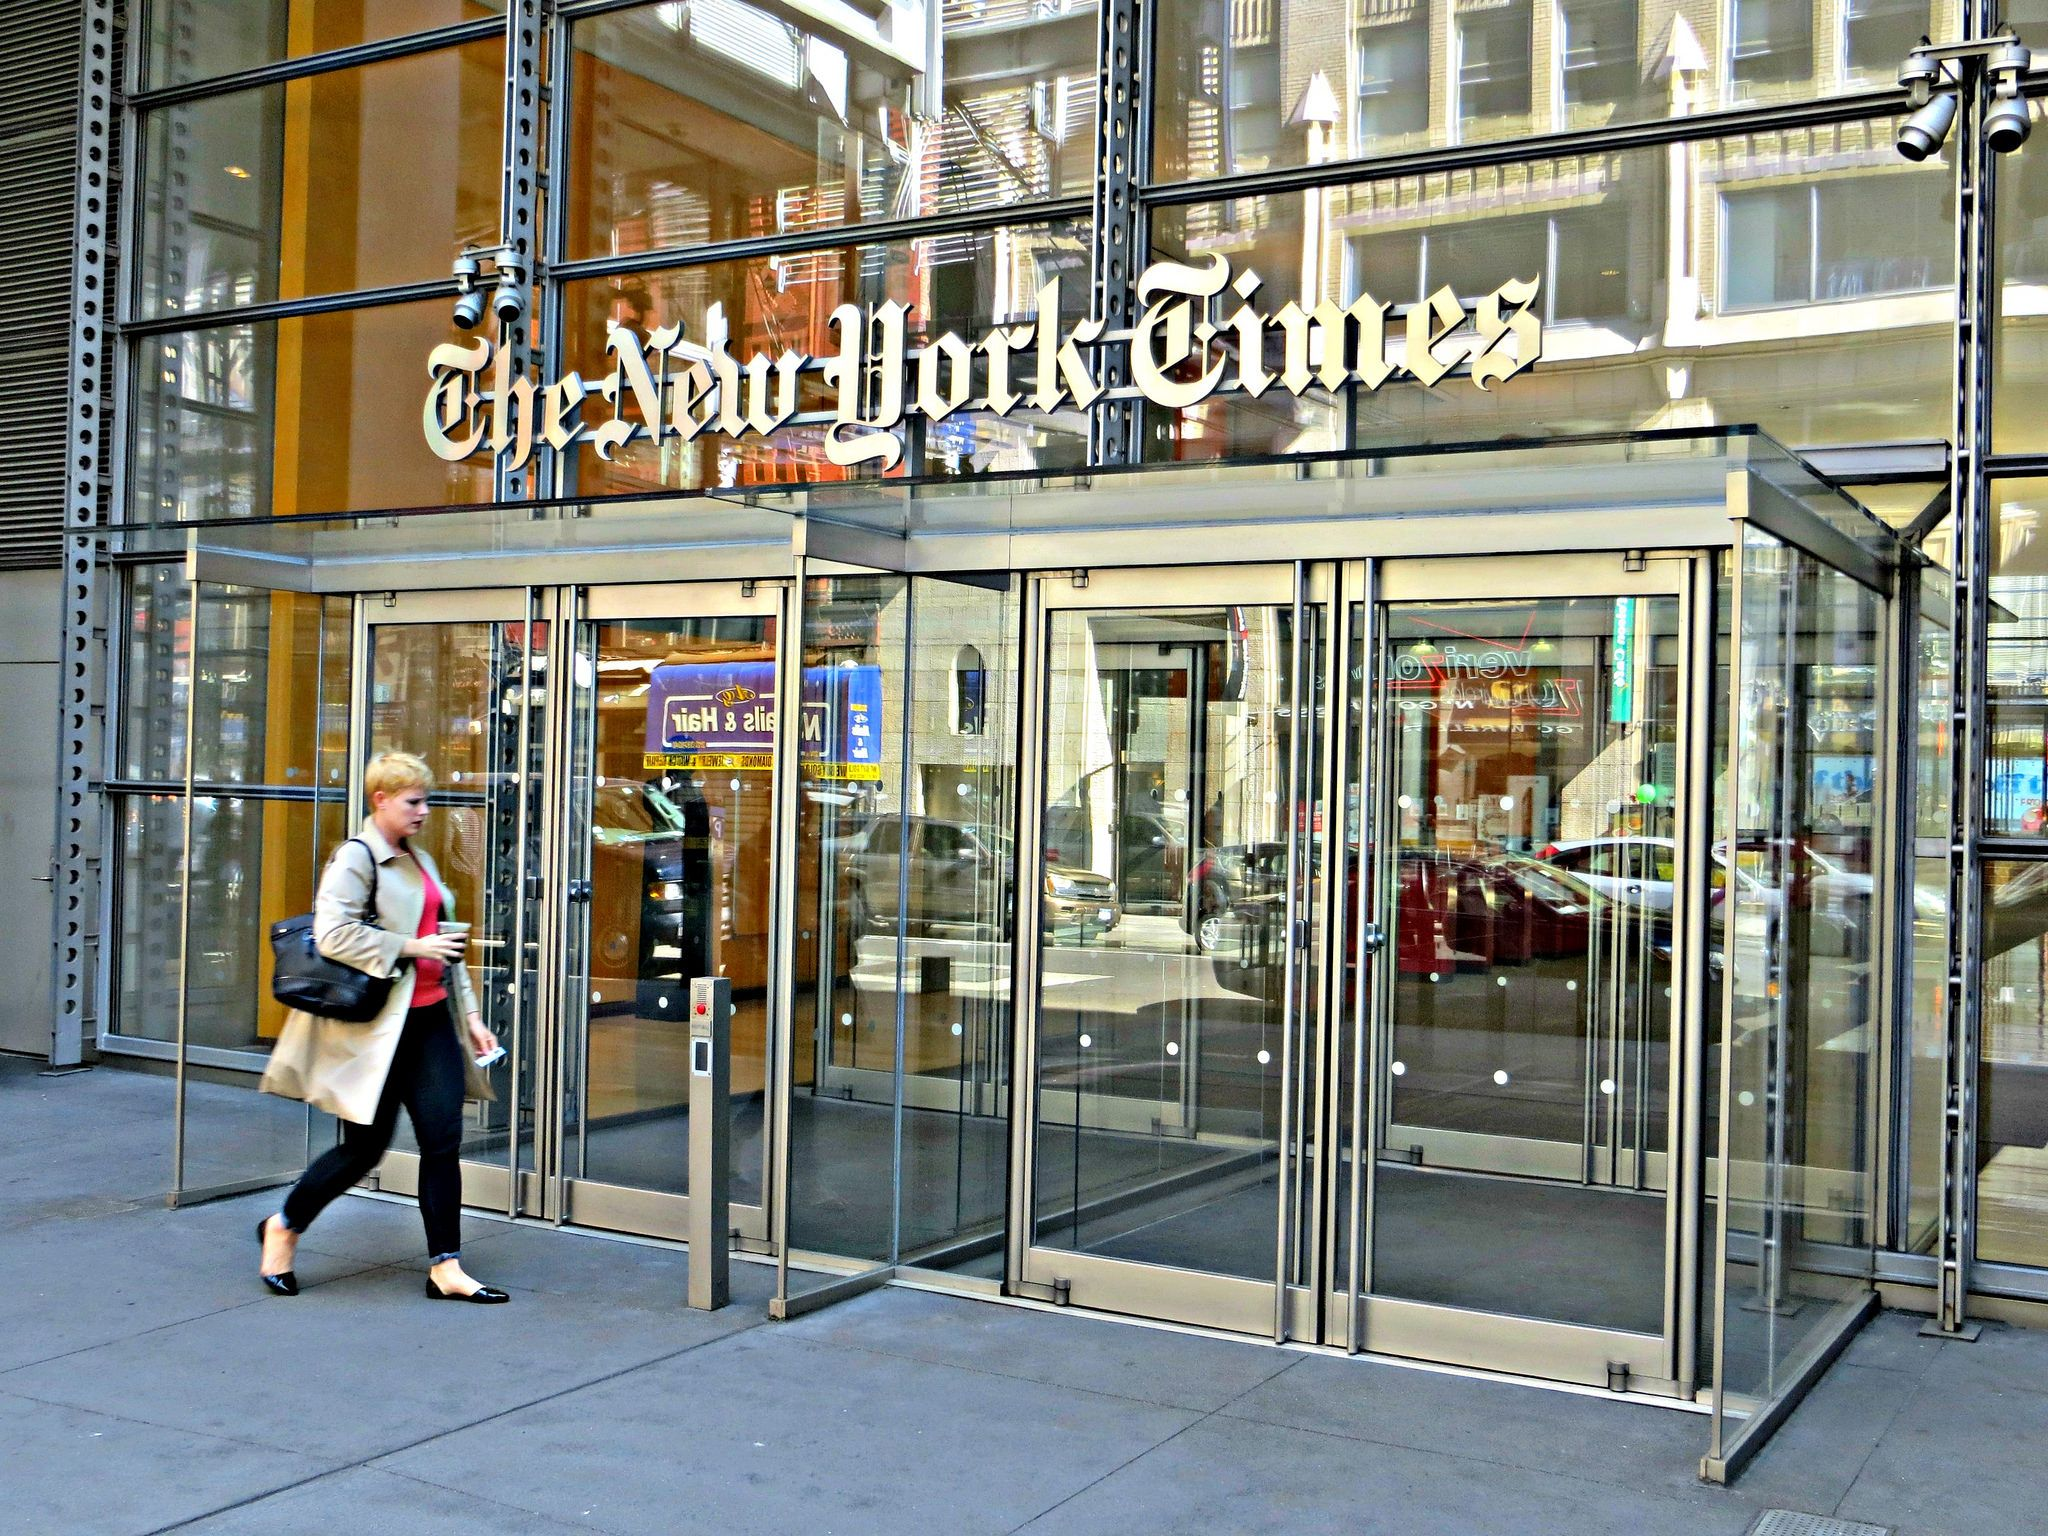 New York Times 620 Eighth Avenue New York City Renzo Piano New York Times Enter Door